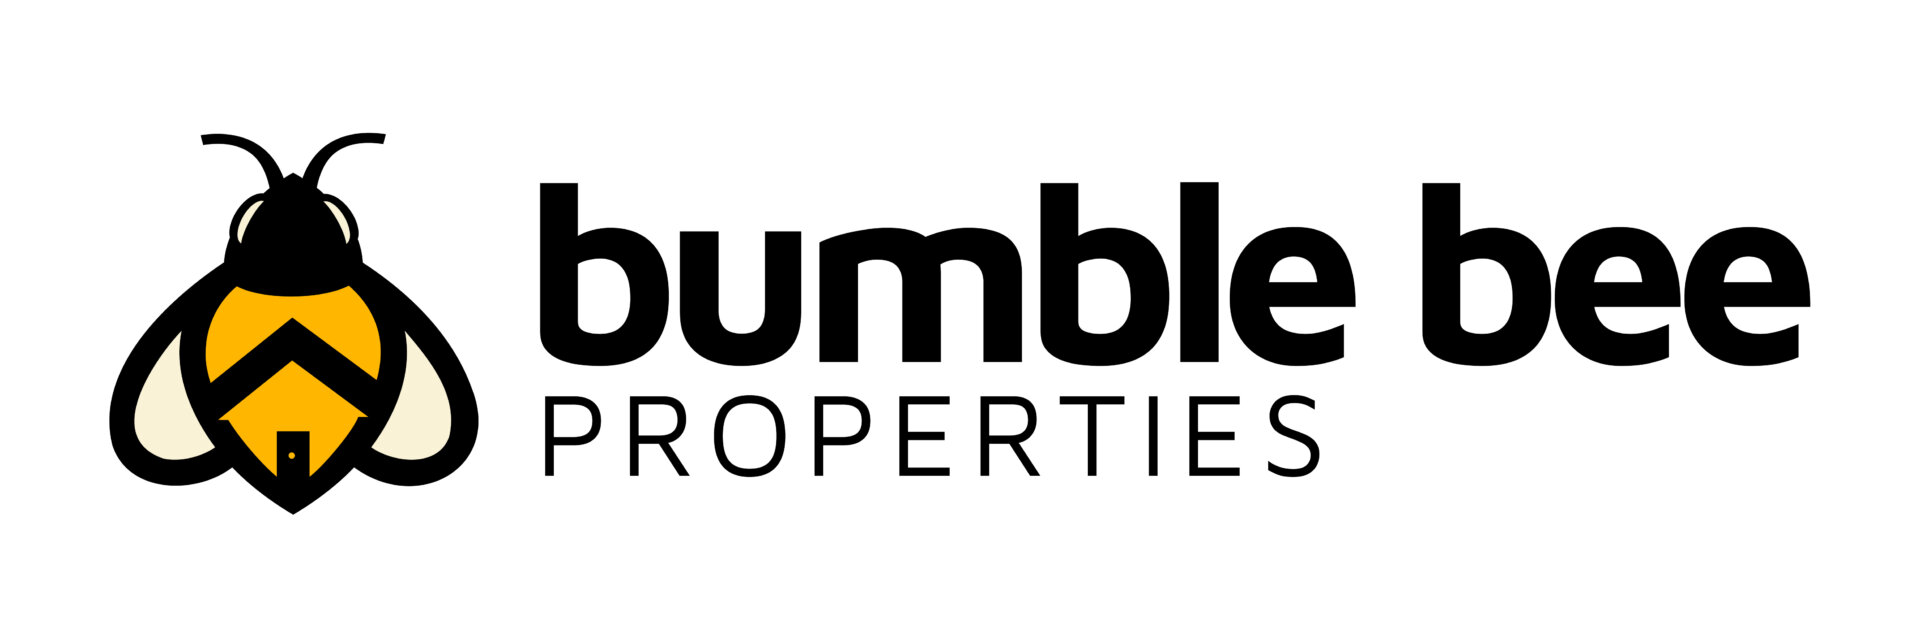 Bumble Bee Properties  logo